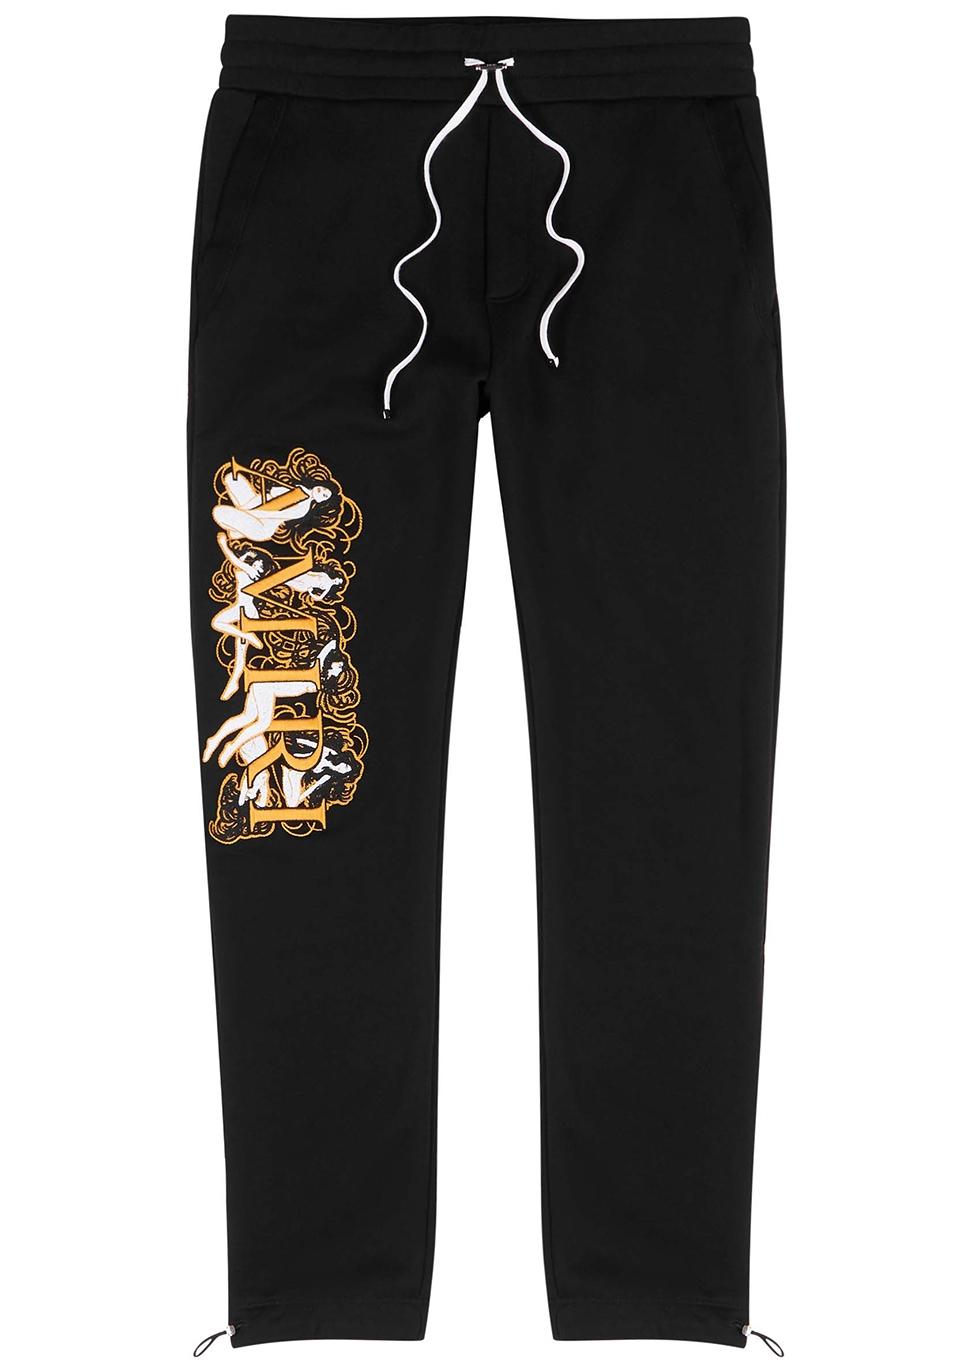 Black embroidered cotton sweatpants